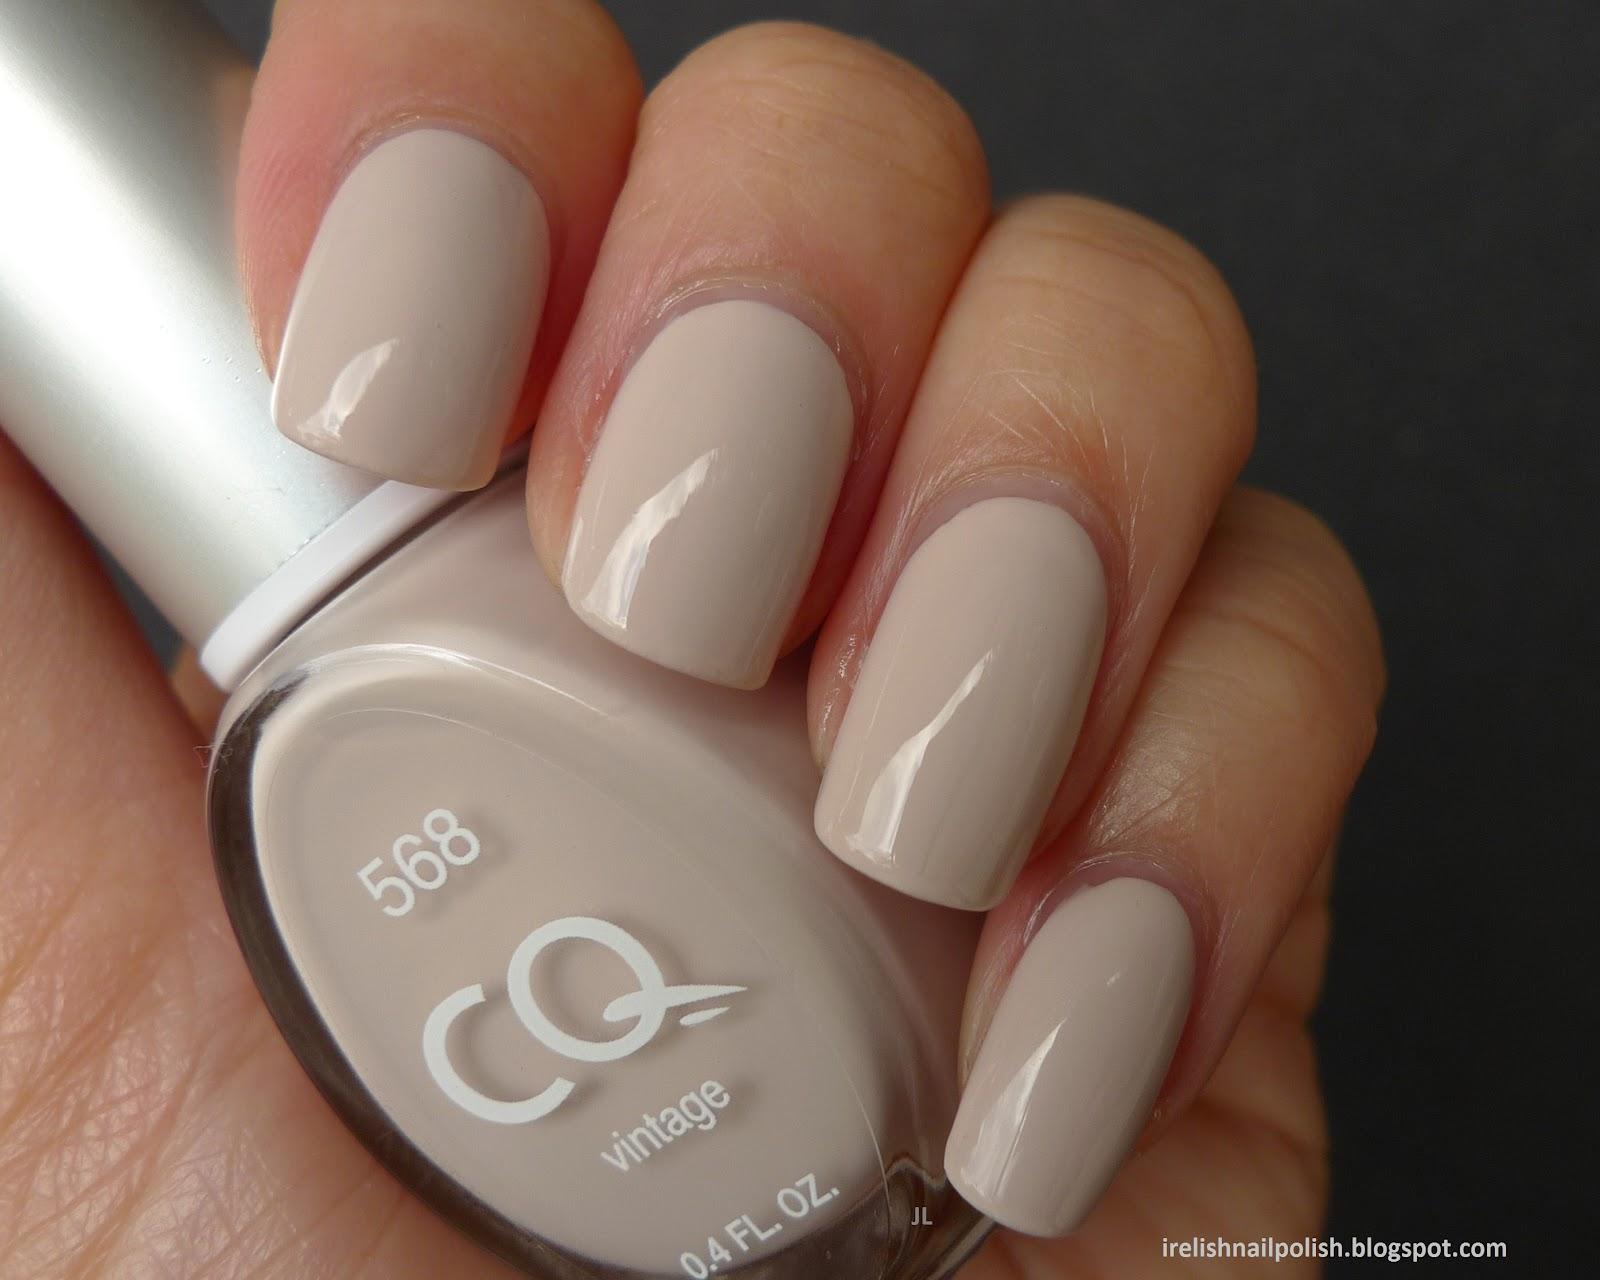 I Relish Nail Polish!: CQ 568 Vintage